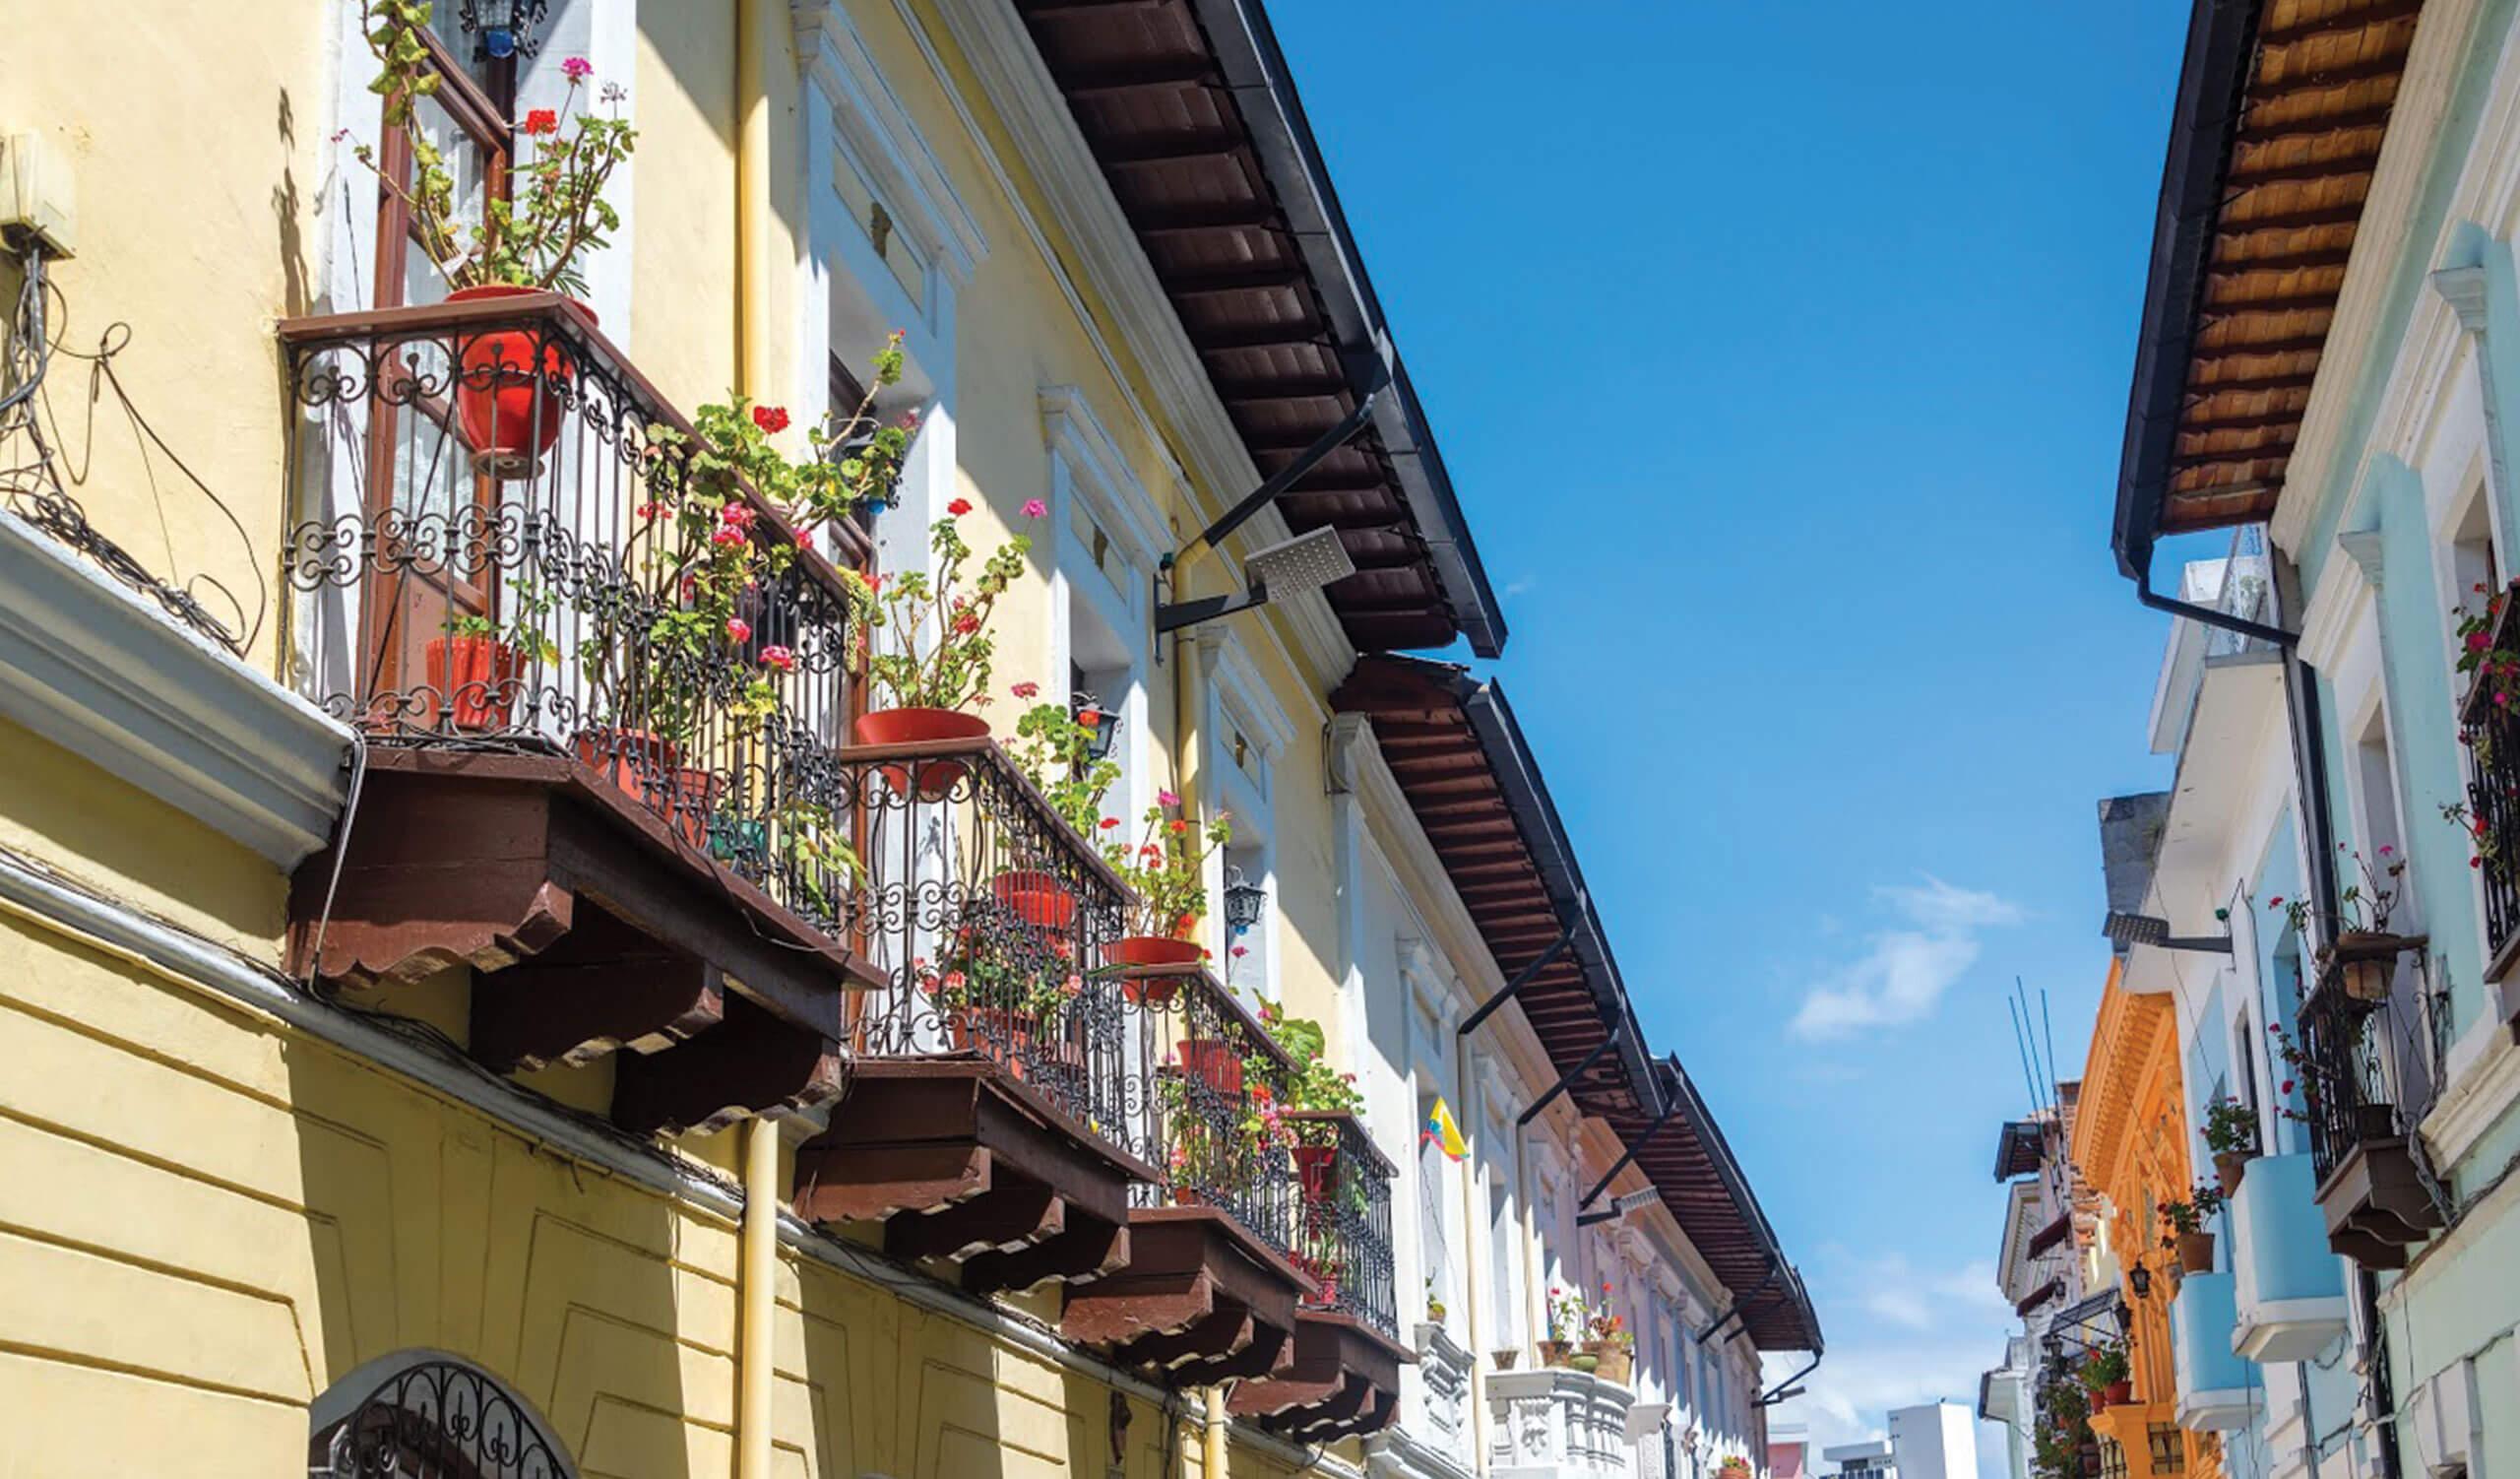 Historic streets of Quito Ecuador